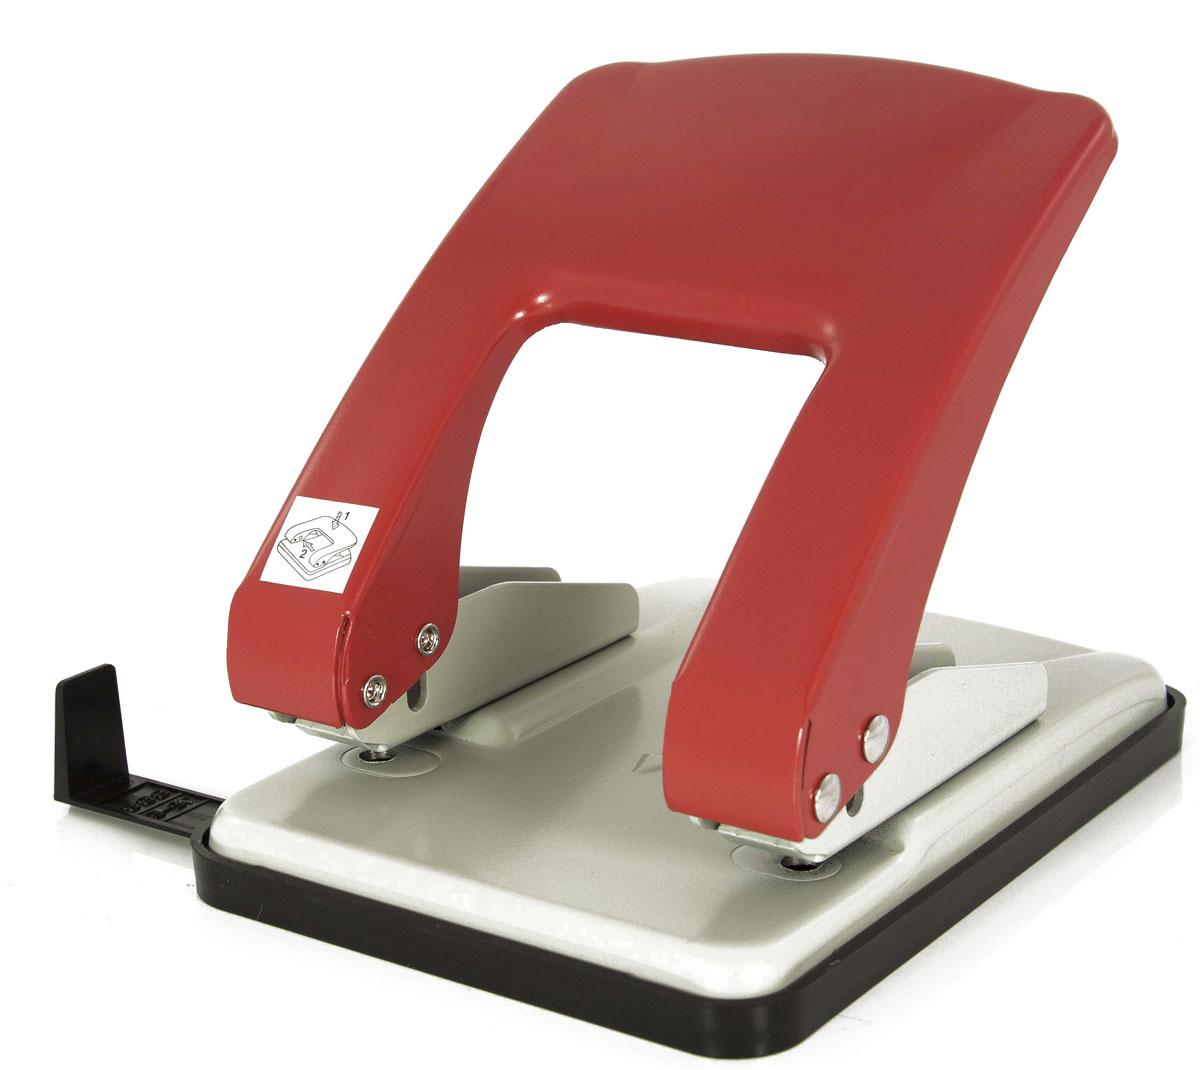 KW-Тrio Дырокол Stylish цвет серый красный дырокол kw trio 976gr red stylish heavy duty до 40 листов красный линейка